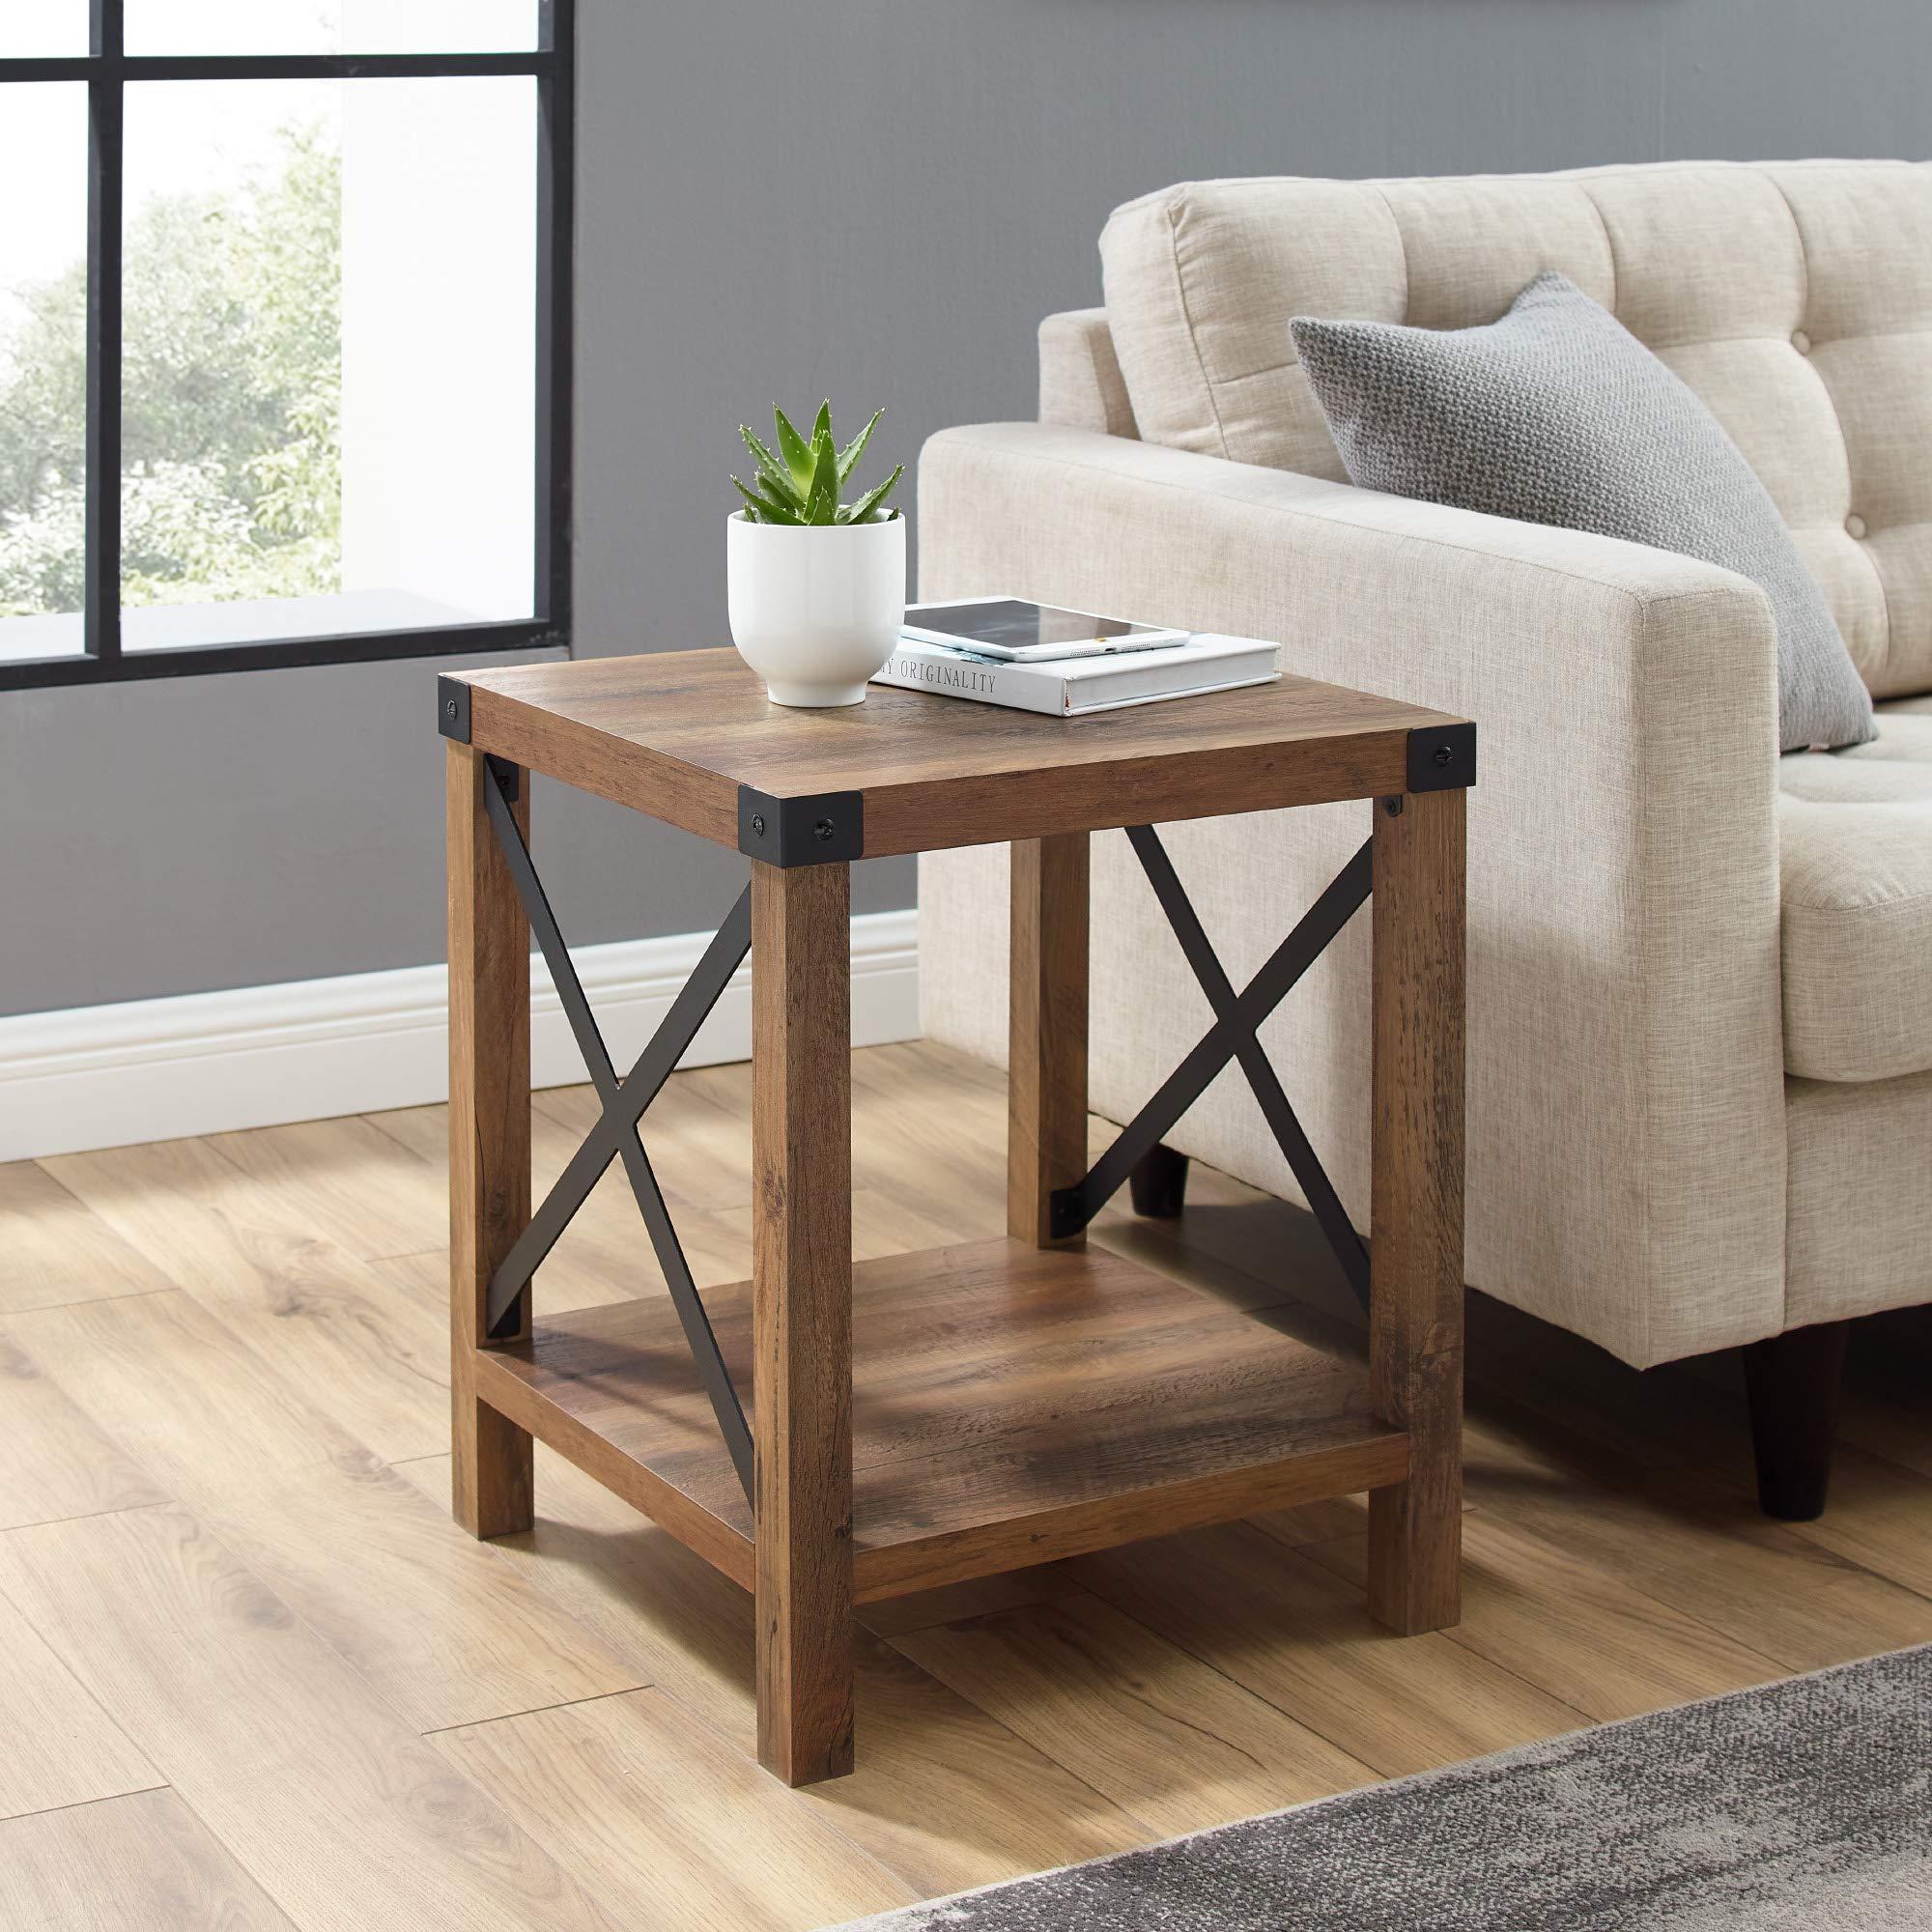 Walker Edison Sedalia Modern Farmhouse Metal X Side Table, 18 Inch, Reclaimed Barnwood